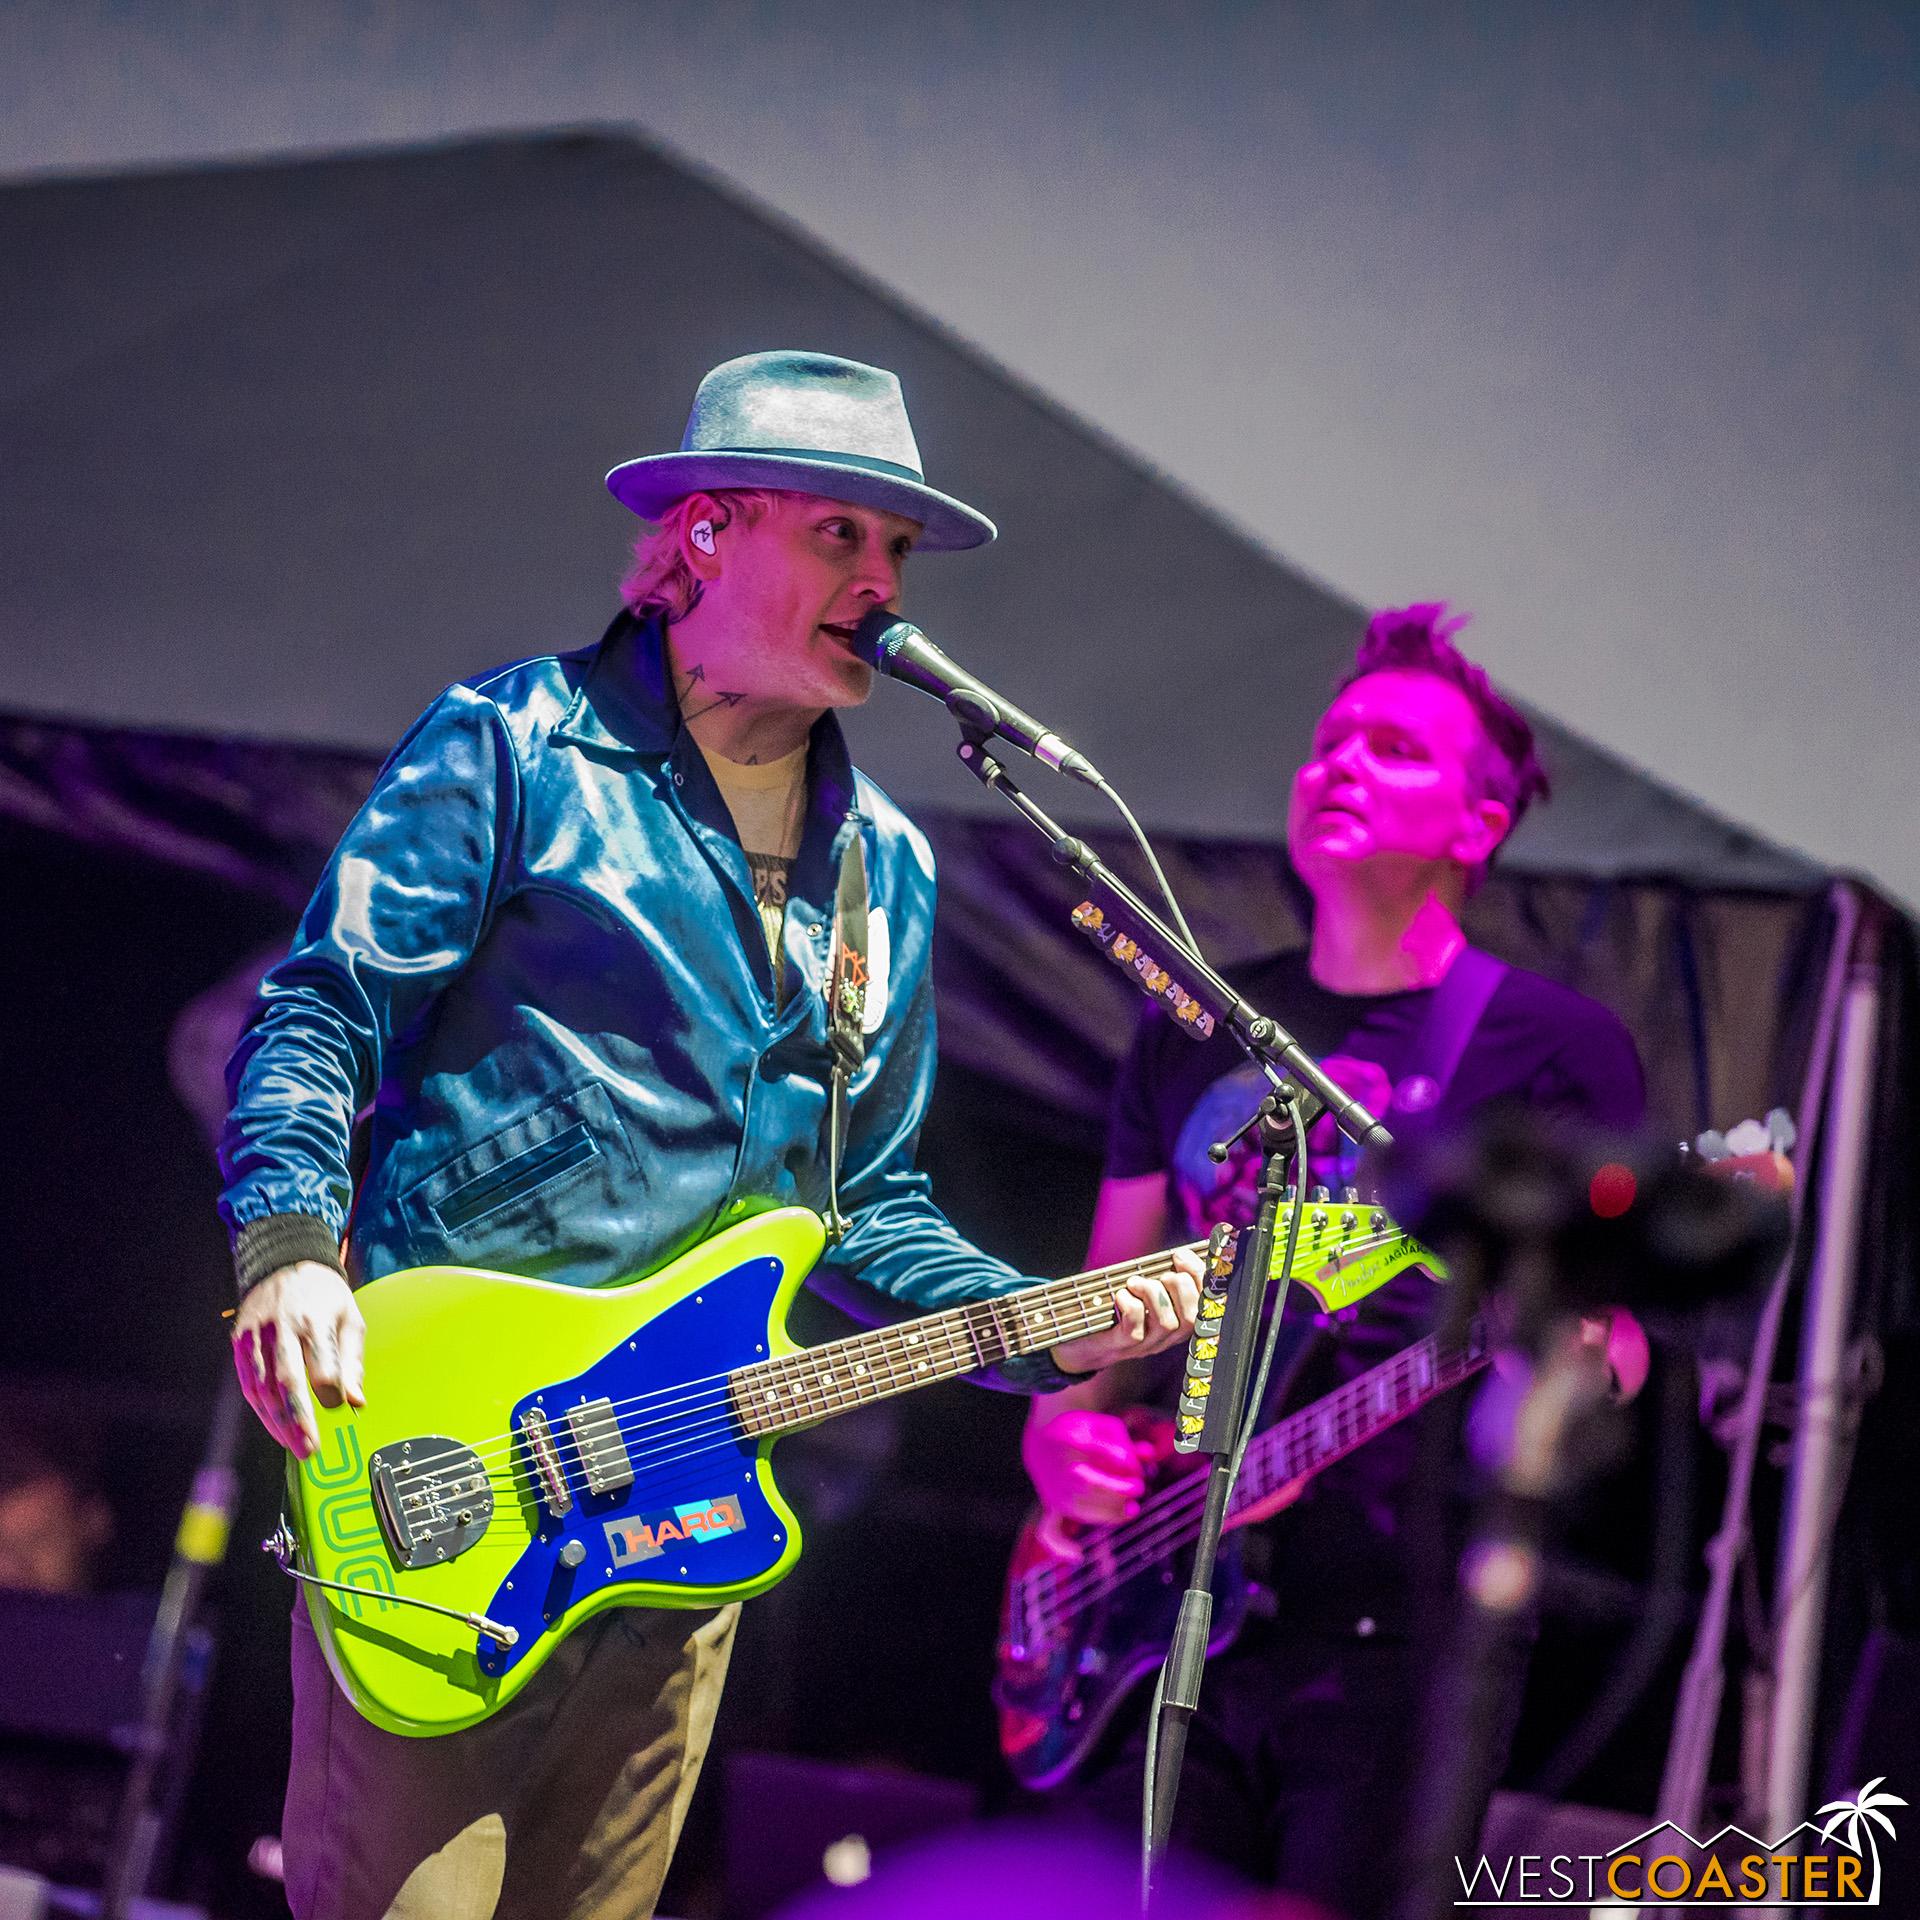 Matt Skiba and his lime green guitar.